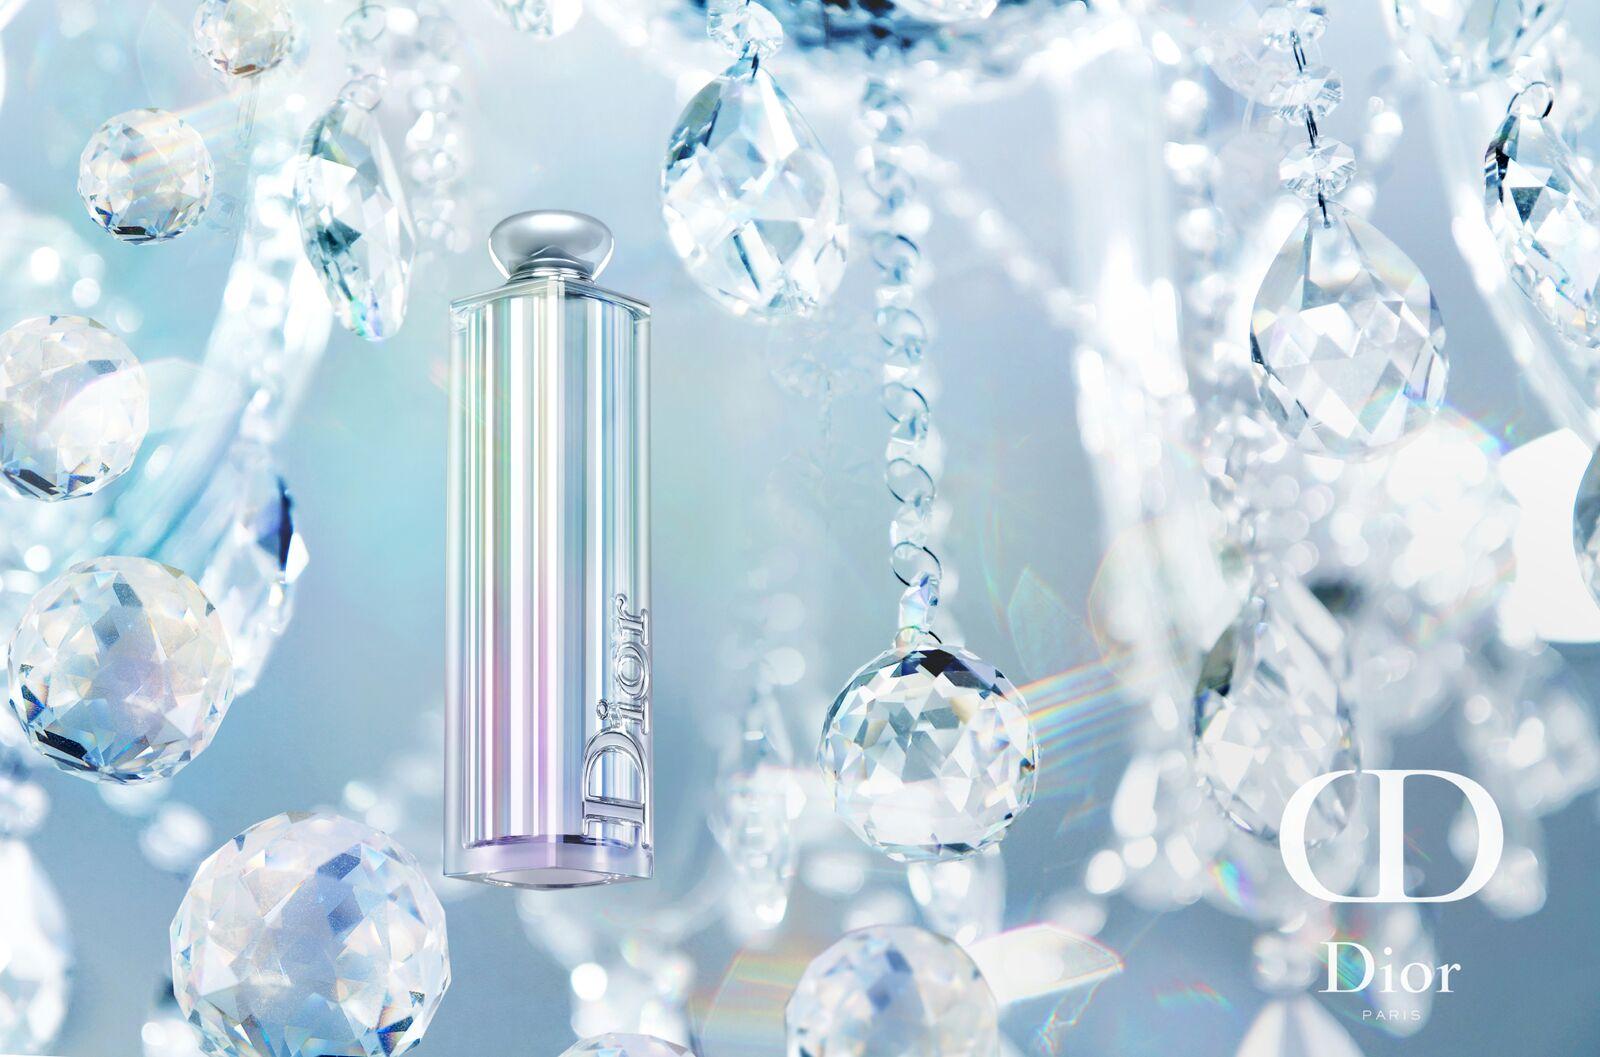 Dior Lip Balm with Crystals